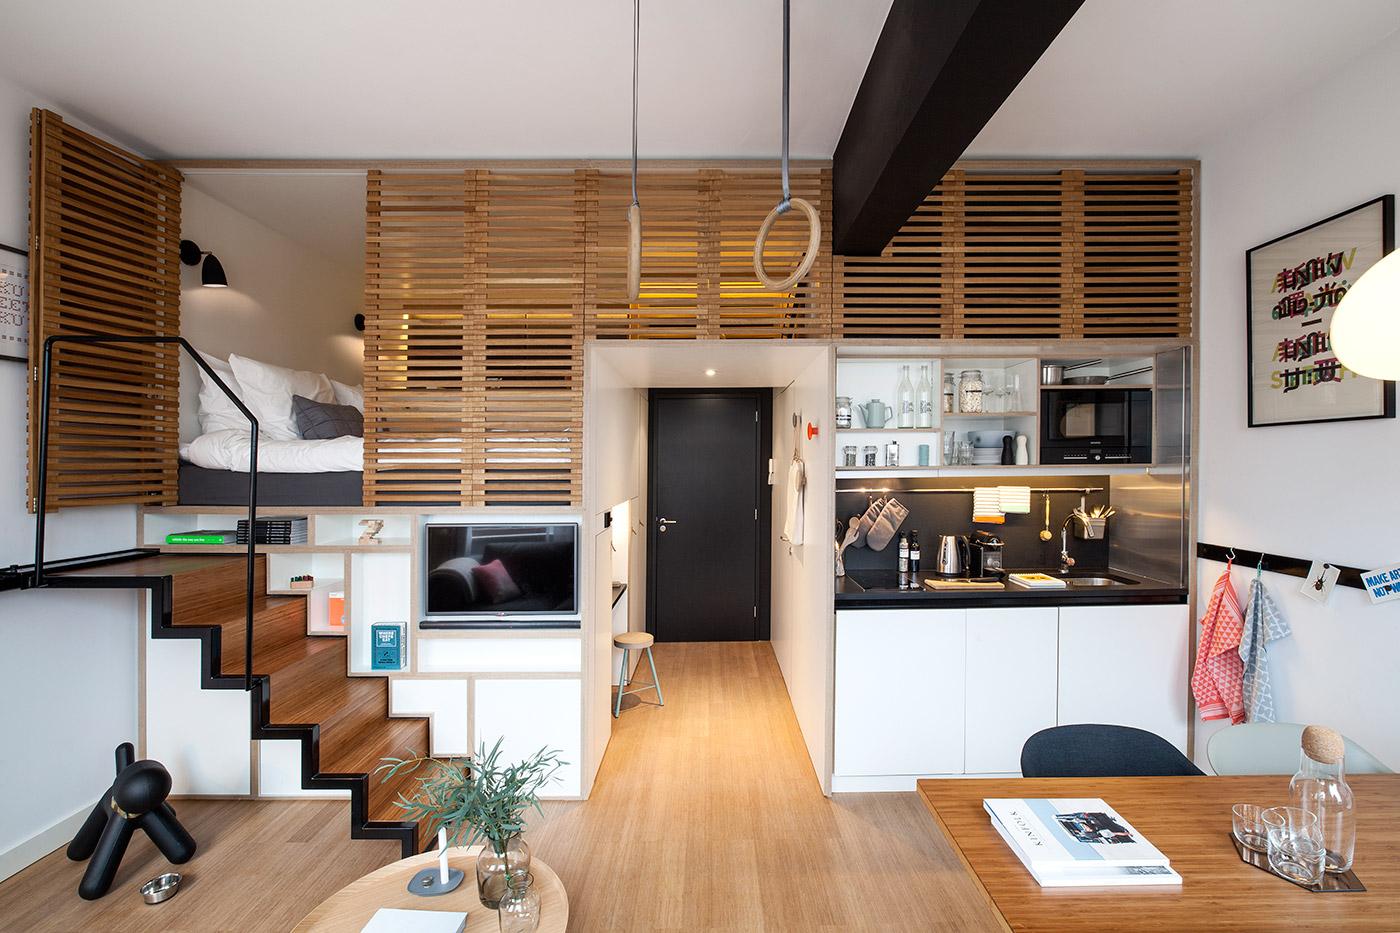 Studio Apartment Design Part - 20: Tweet On Twitter. © Zoku. Roohome.com U2013 Having A Small Apartment Design ...